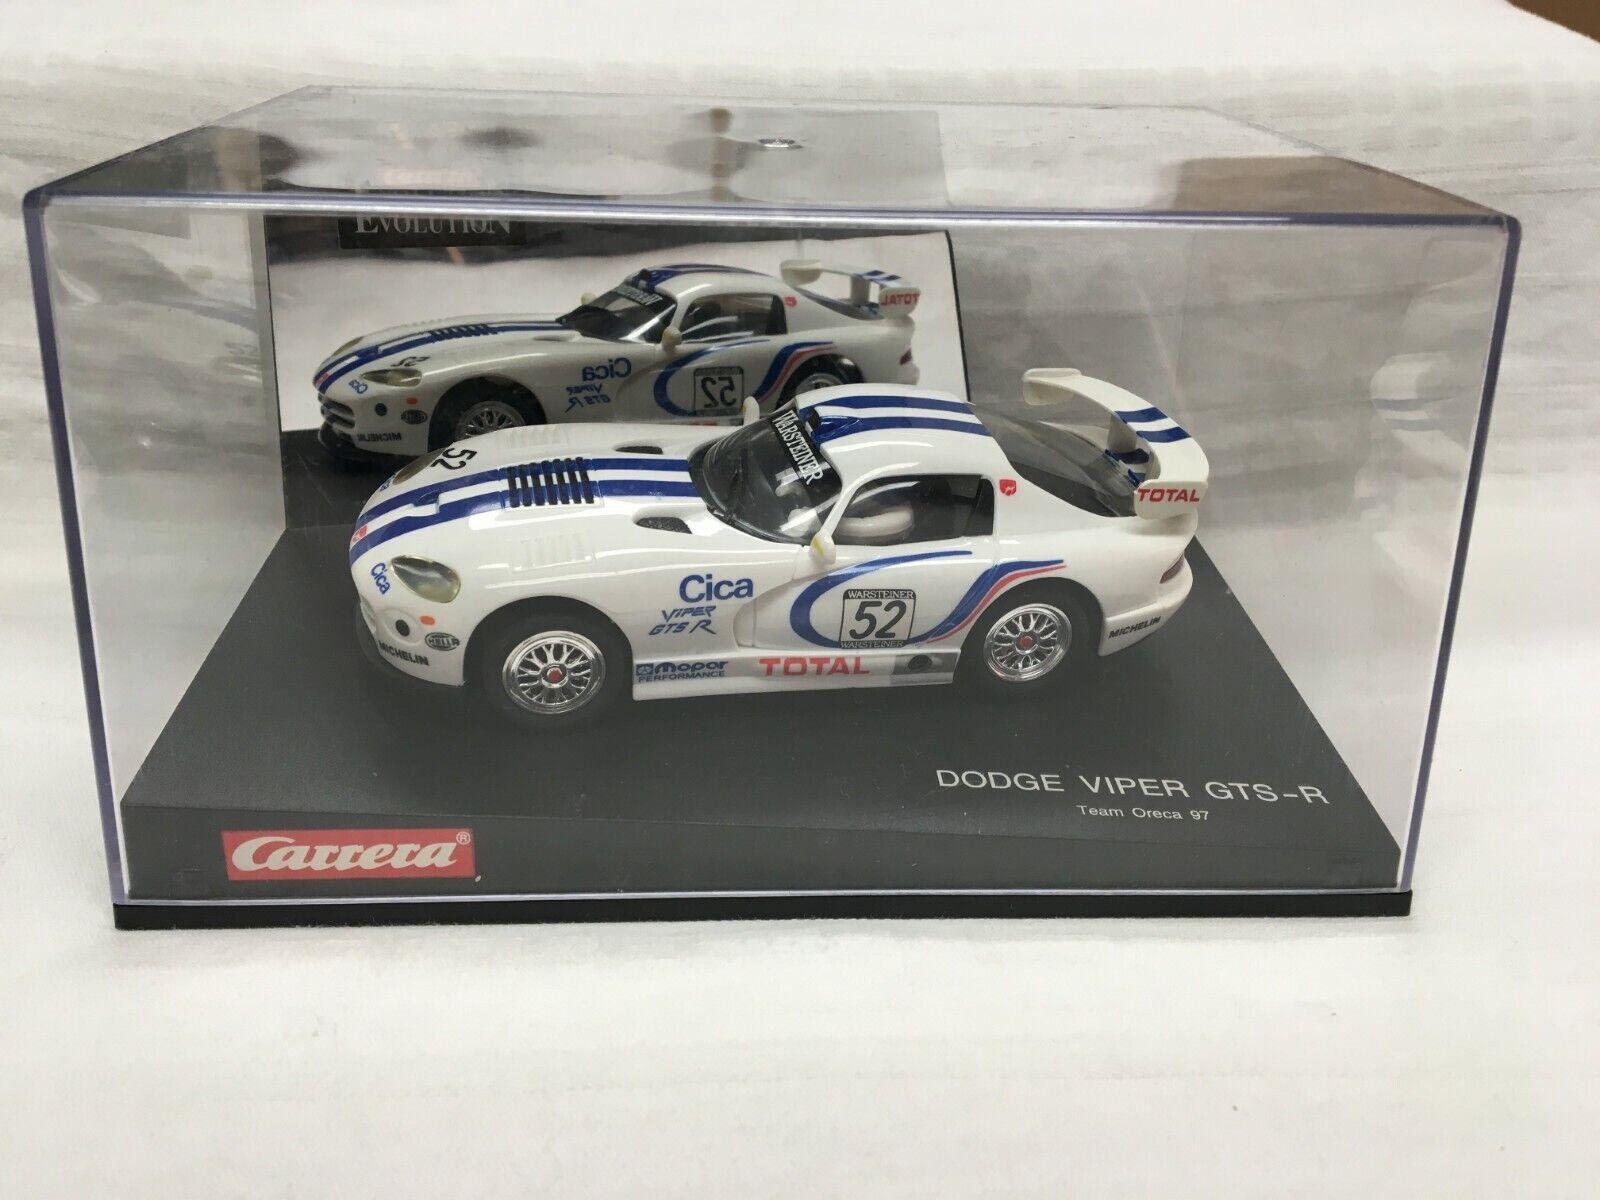 Carrera Evolution 25407 Evo. Dodge Viper GTS-R, Team Oreca 97 NEU OVP